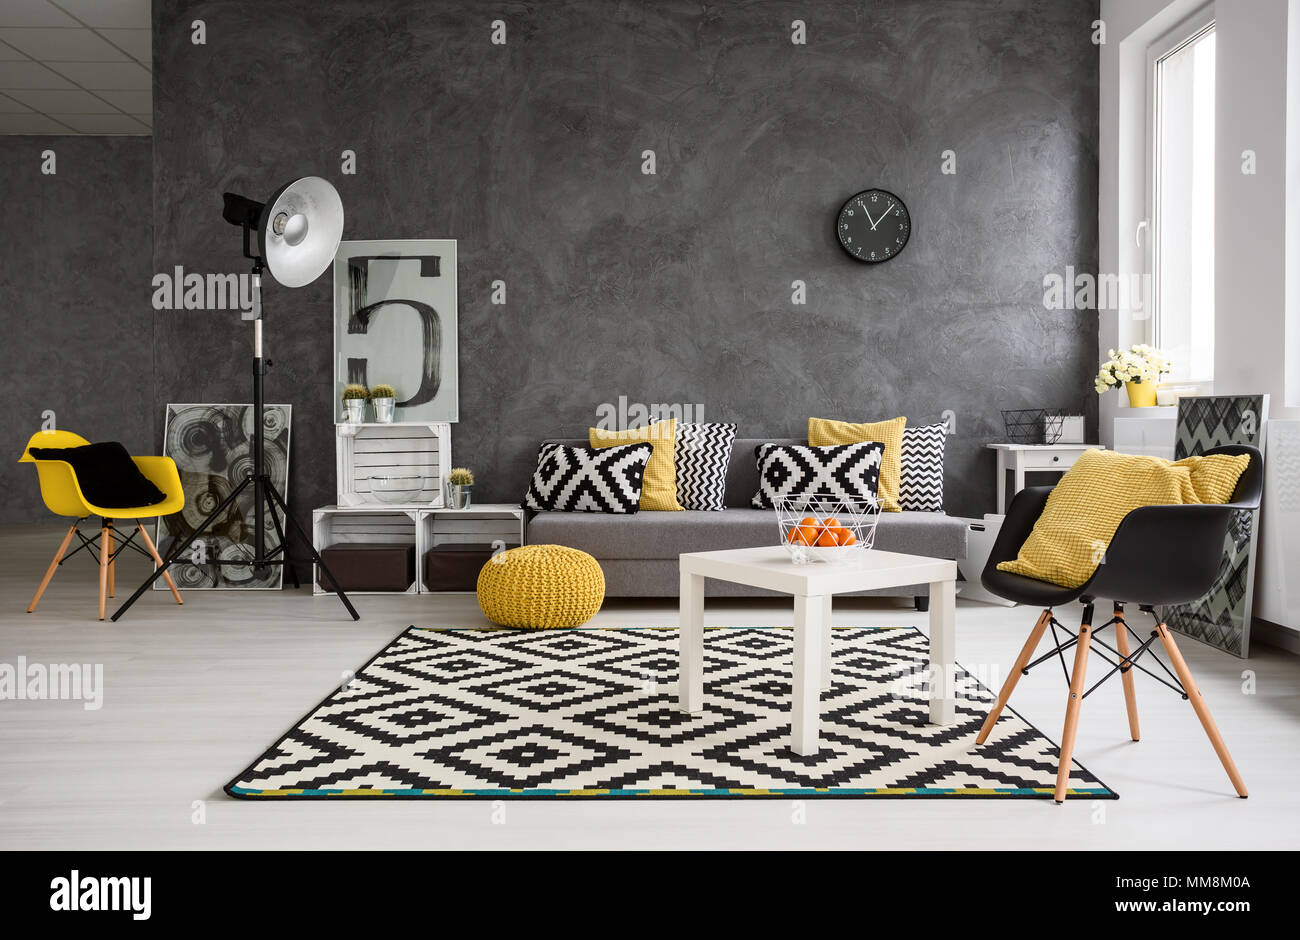 Color gris paredes salon fabulous decoracion salones modernos pintura paredes de salas estar - Decoracion salones modernos pintura ...